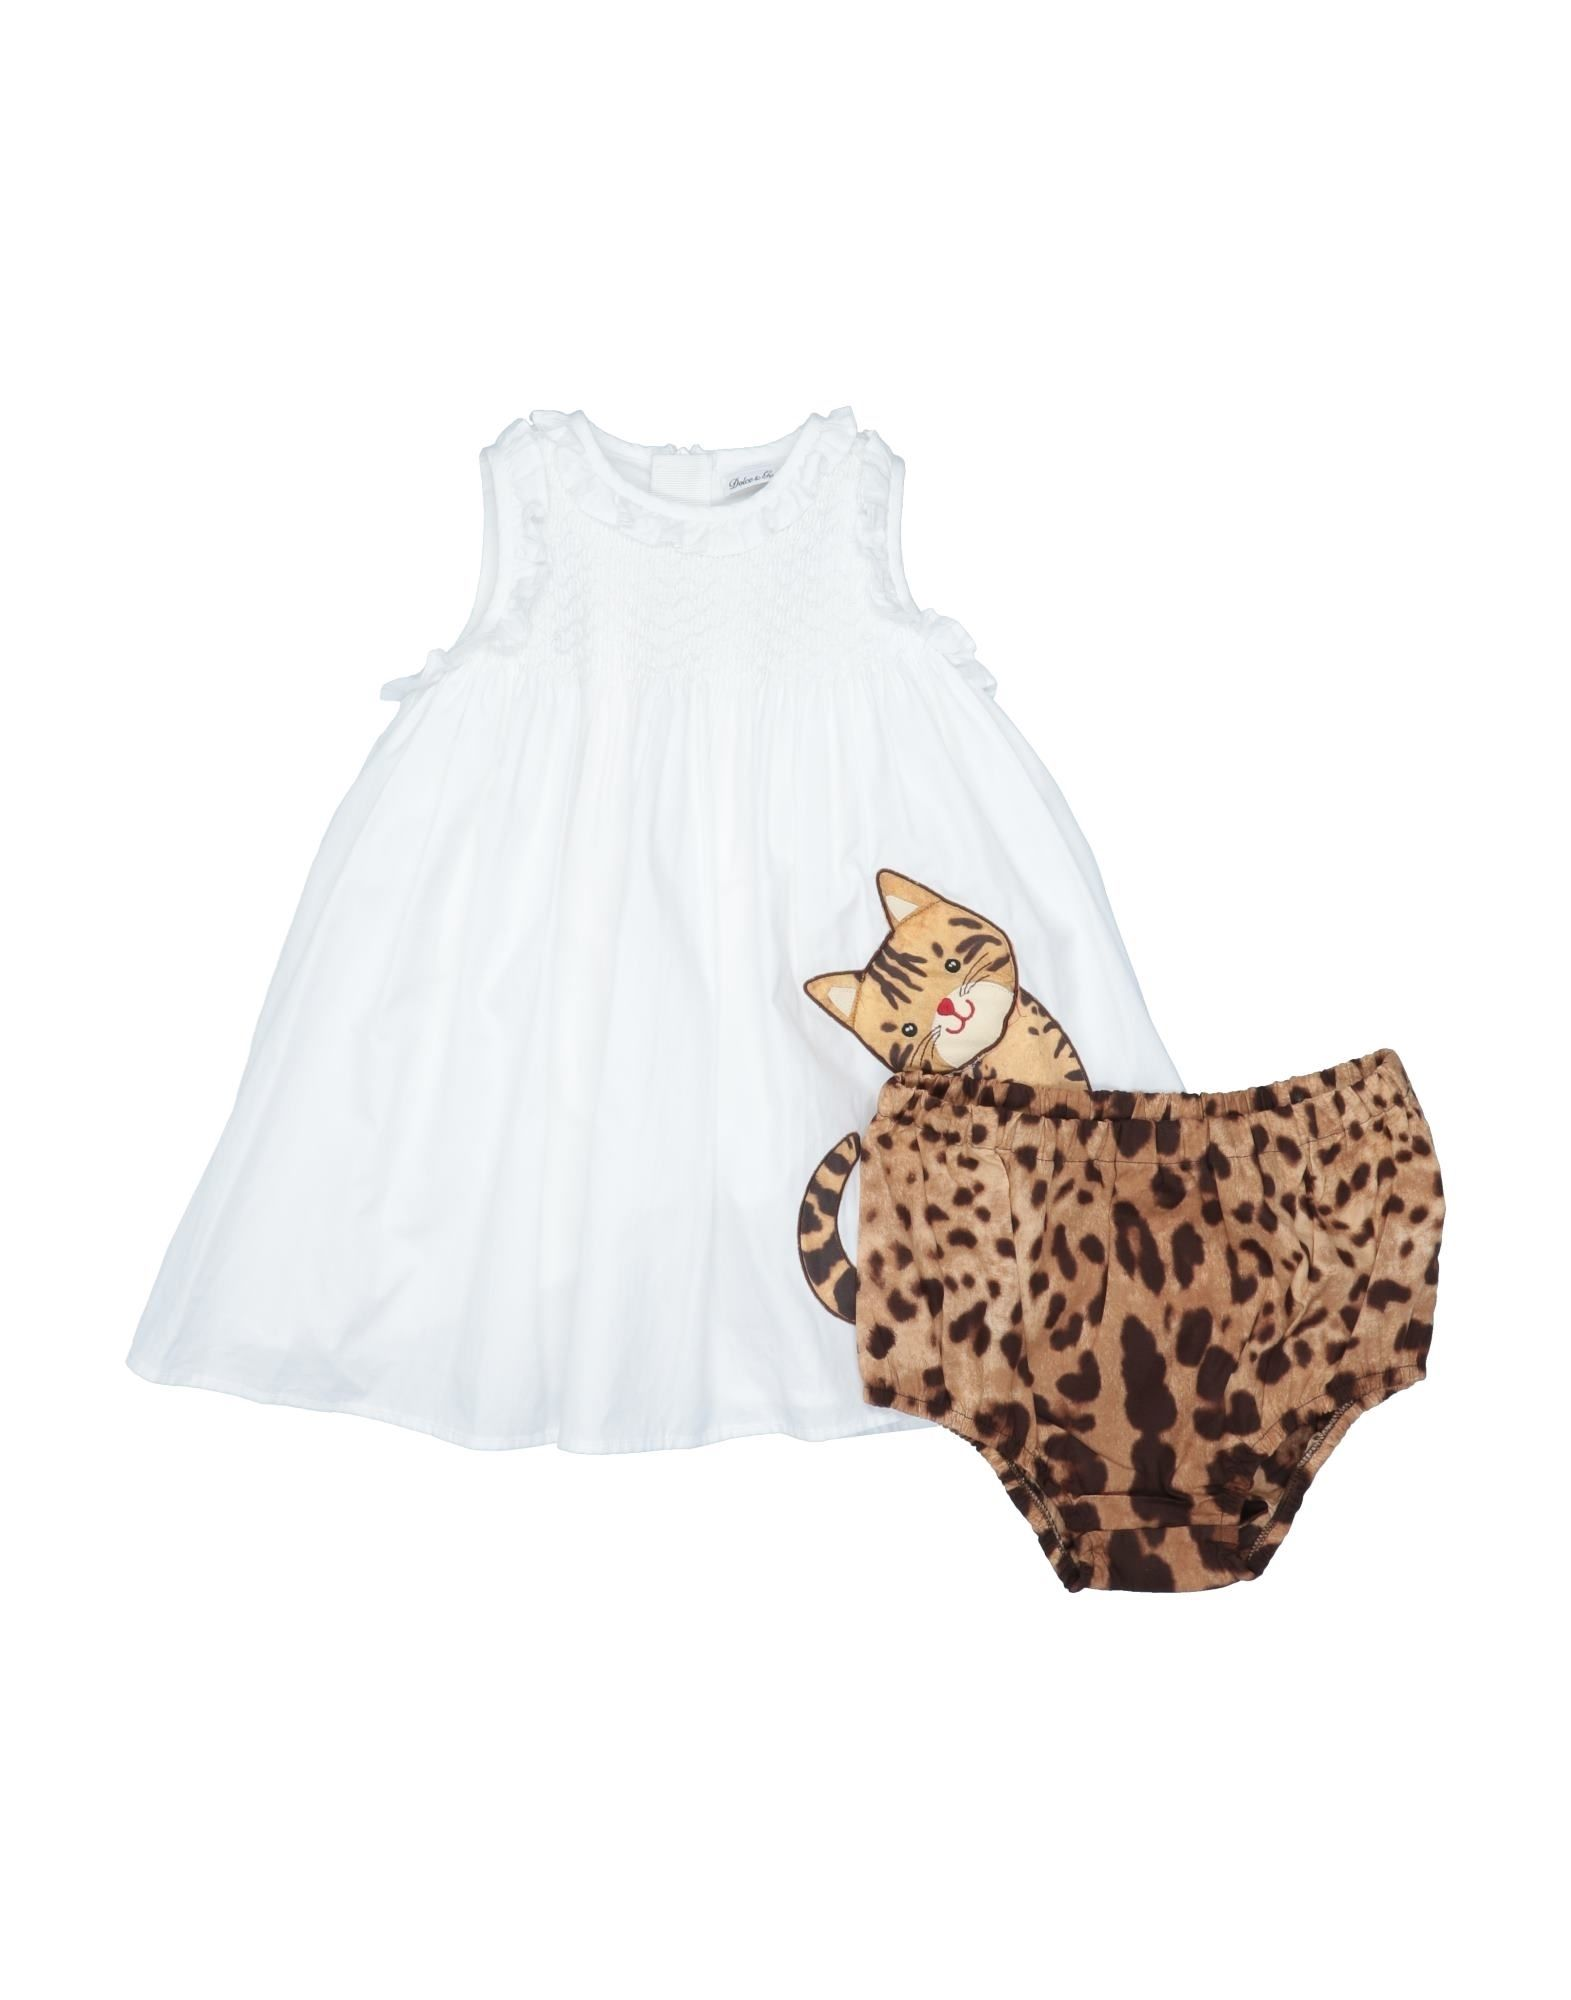 DOLCE & GABBANA Baby dresses - Item 15027824